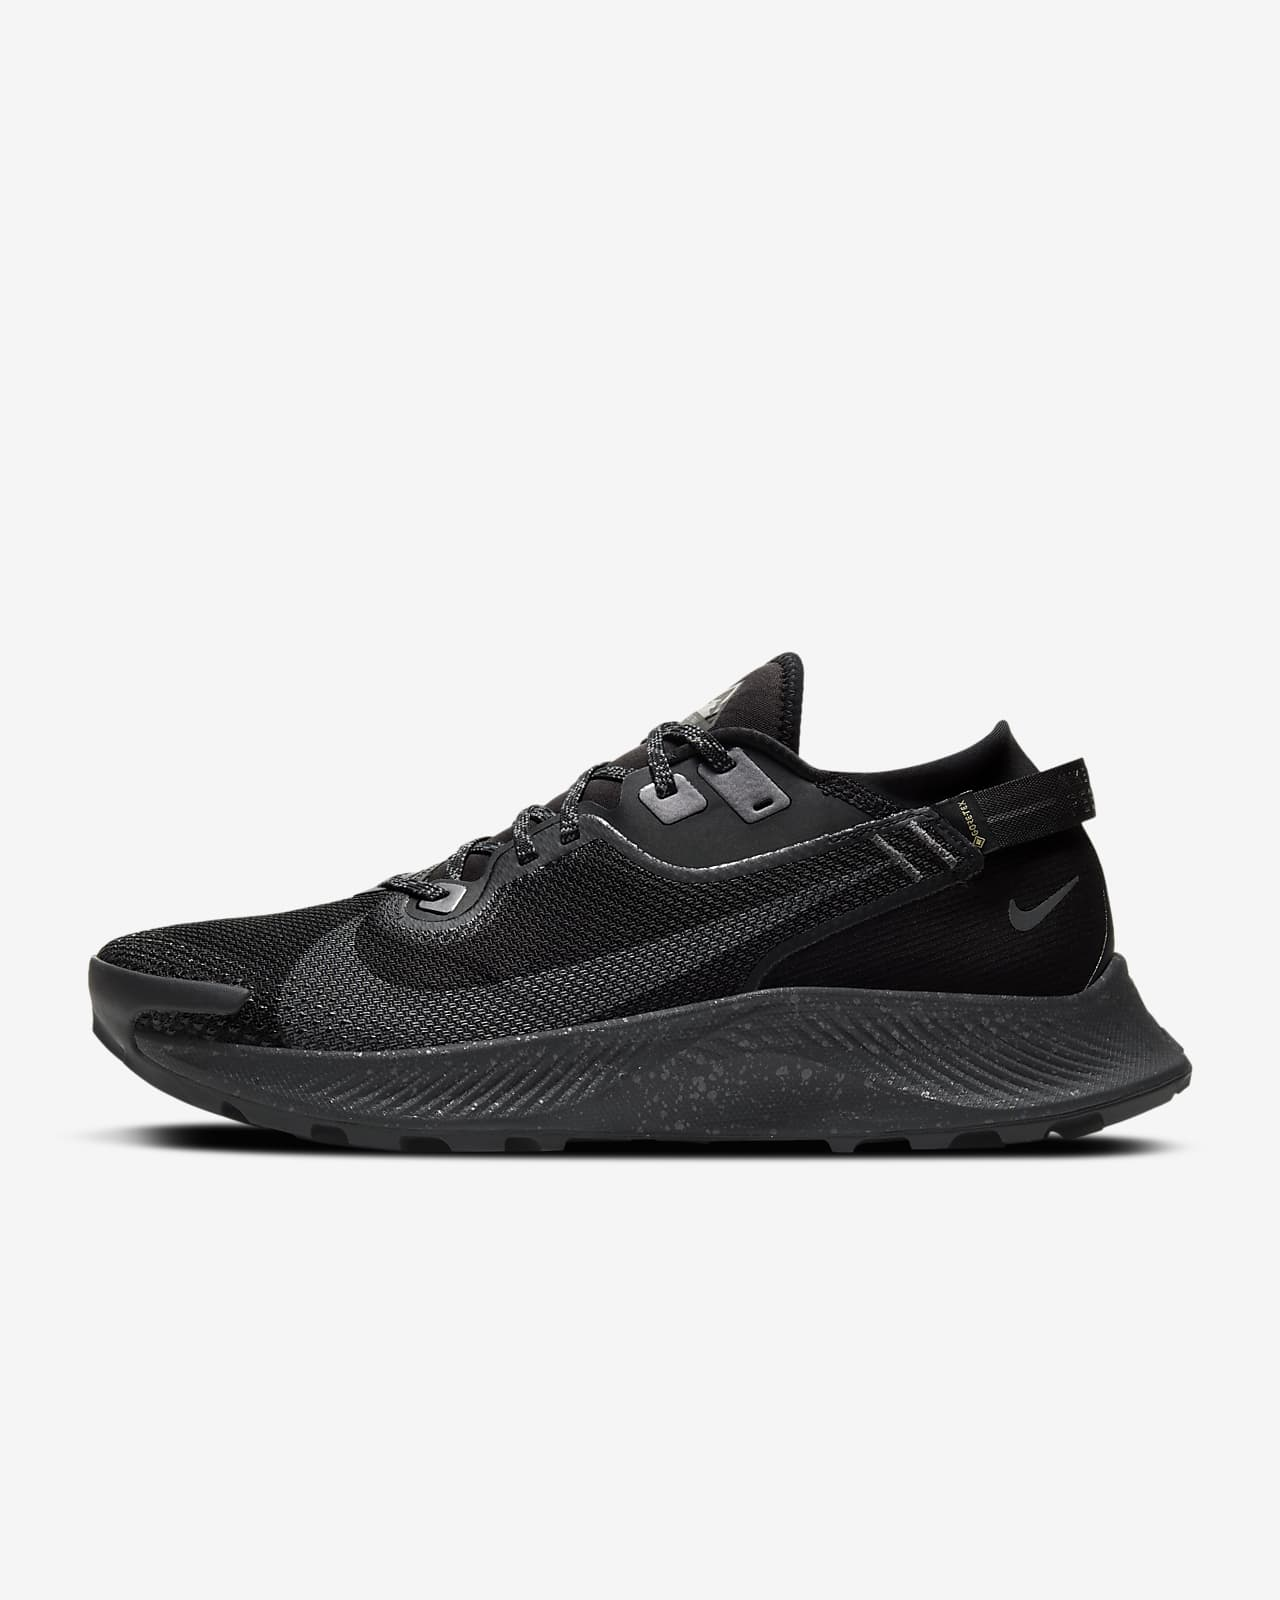 Nike Pegasus Trail 2 GORE-TEX Men'S Waterproof Trail Running Shoes